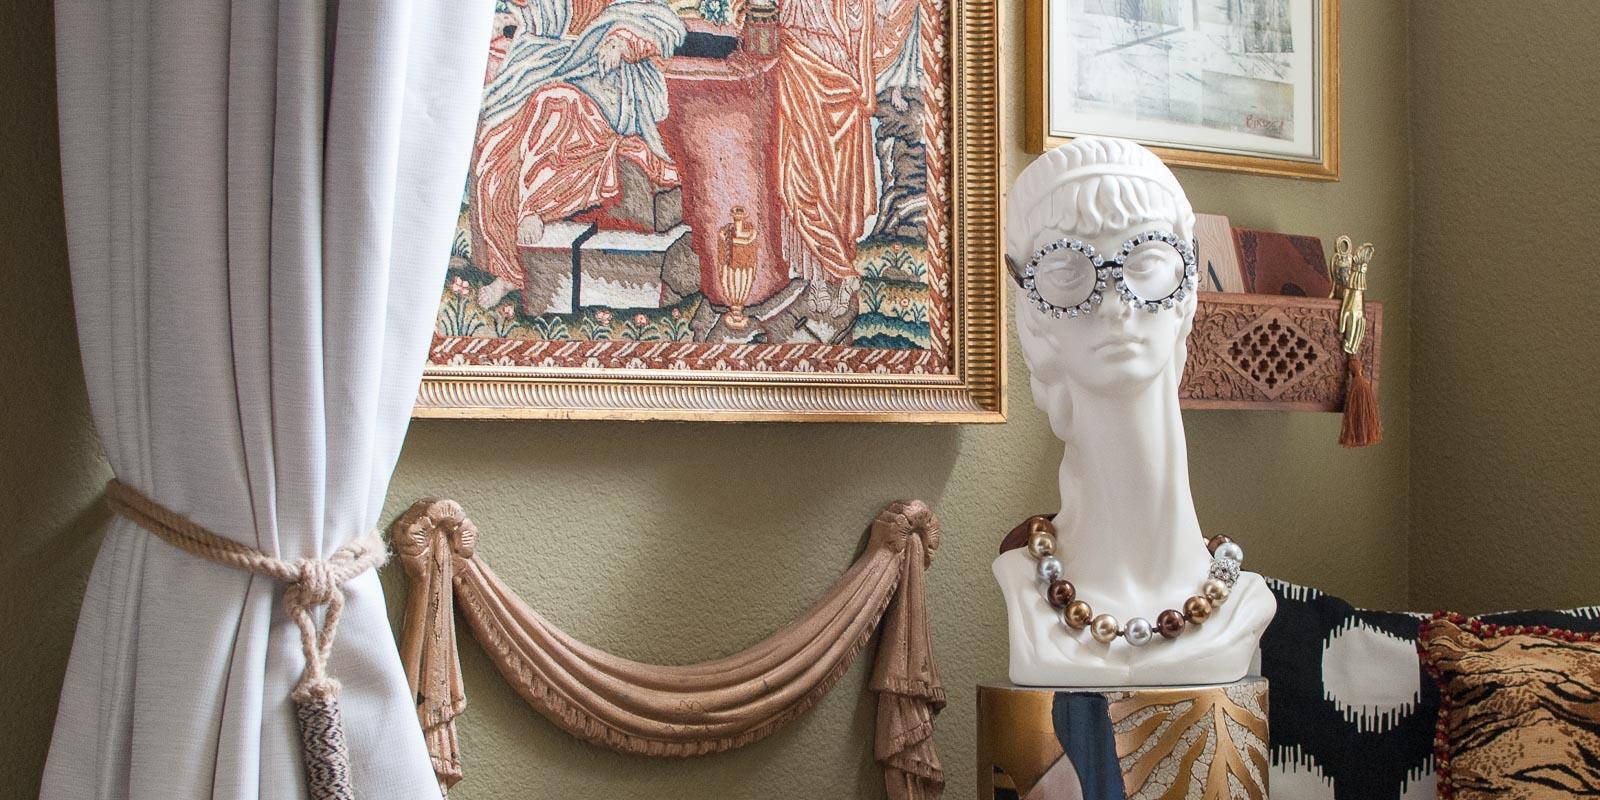 Inspired by iris apfel master bedroom gallery wall for Bedroom gallery wall